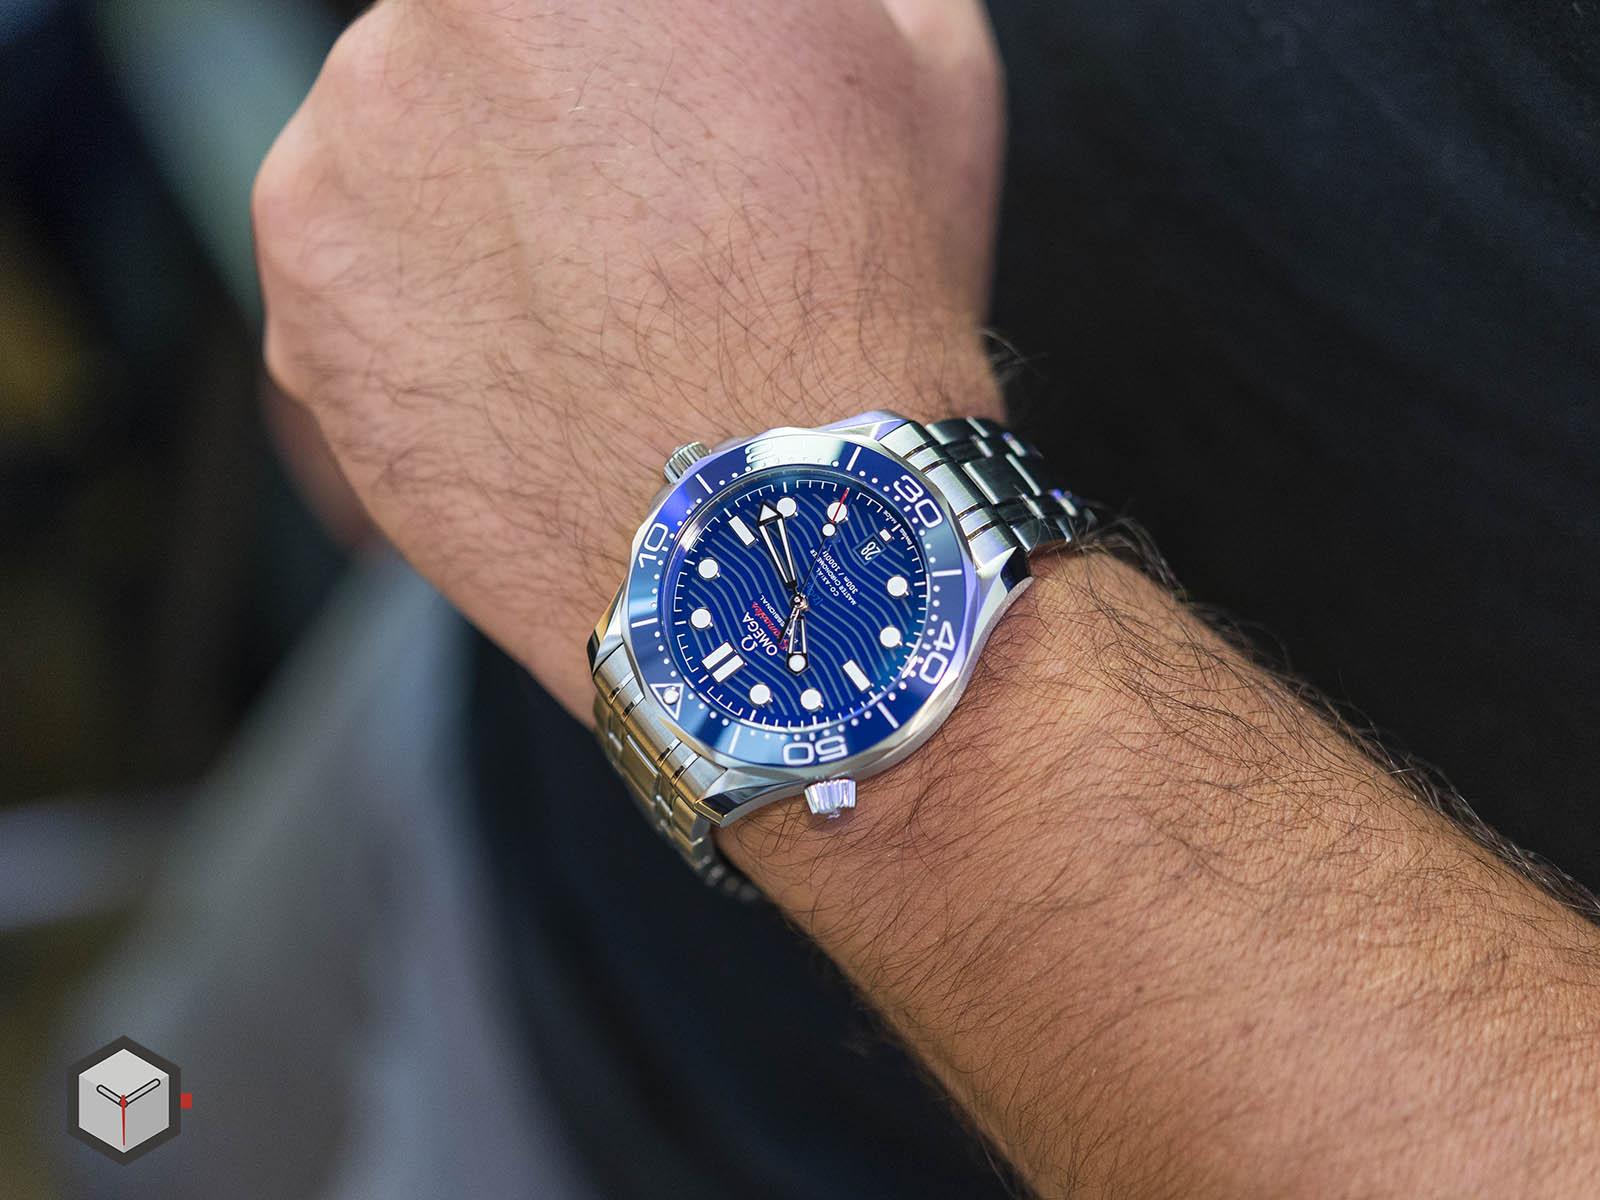 210-30-42-20-03-001-omega-seamaster-professional-diver-300m-11.jpg